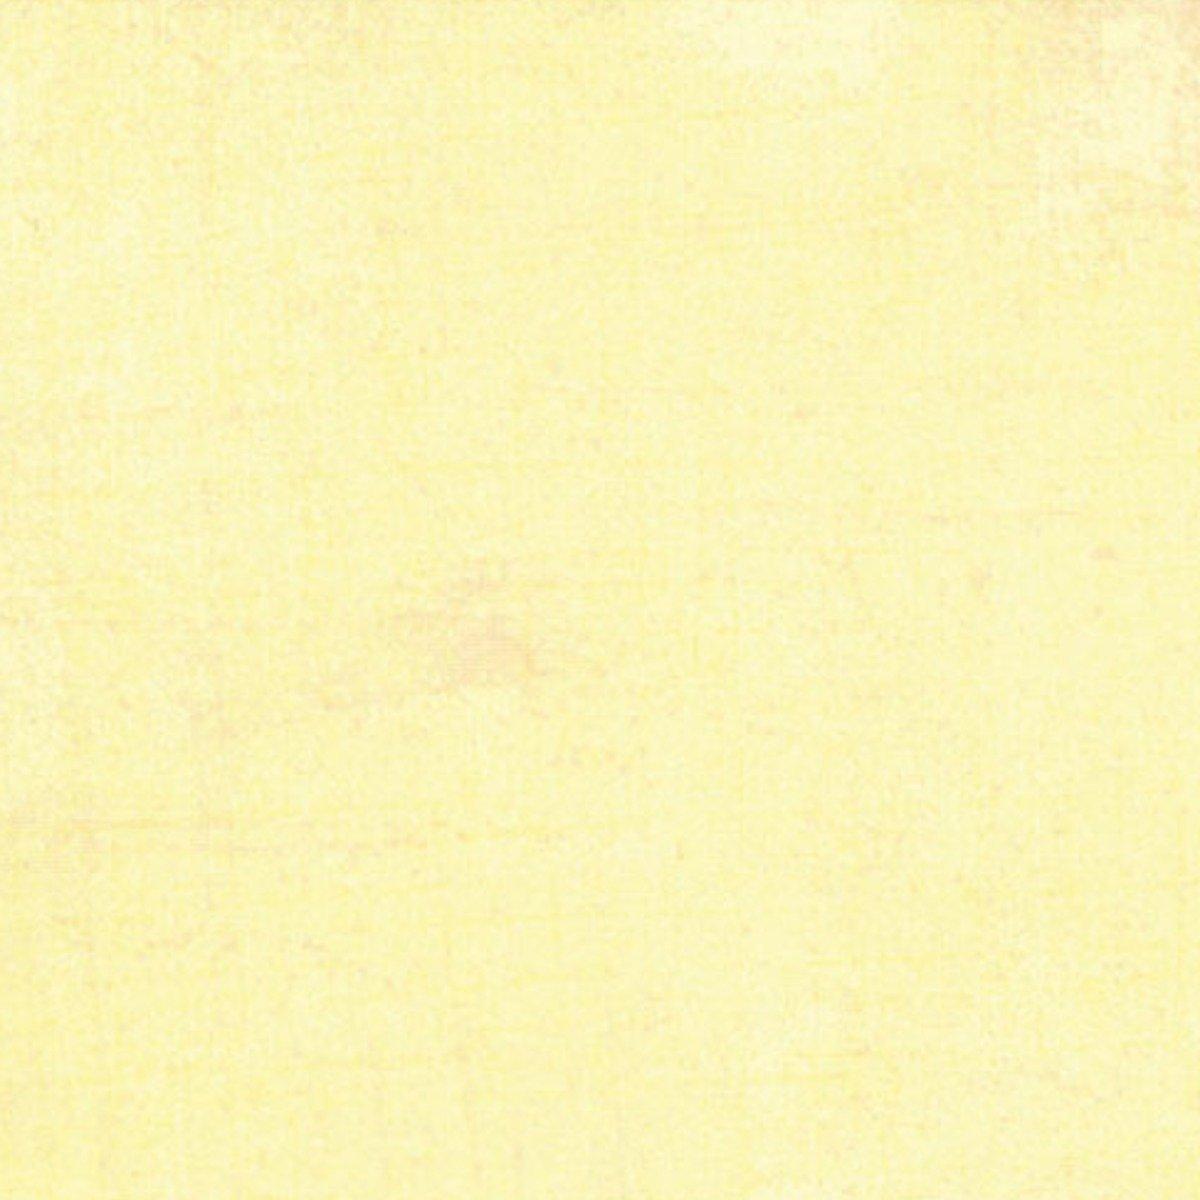 Grunge - Lemon Grass